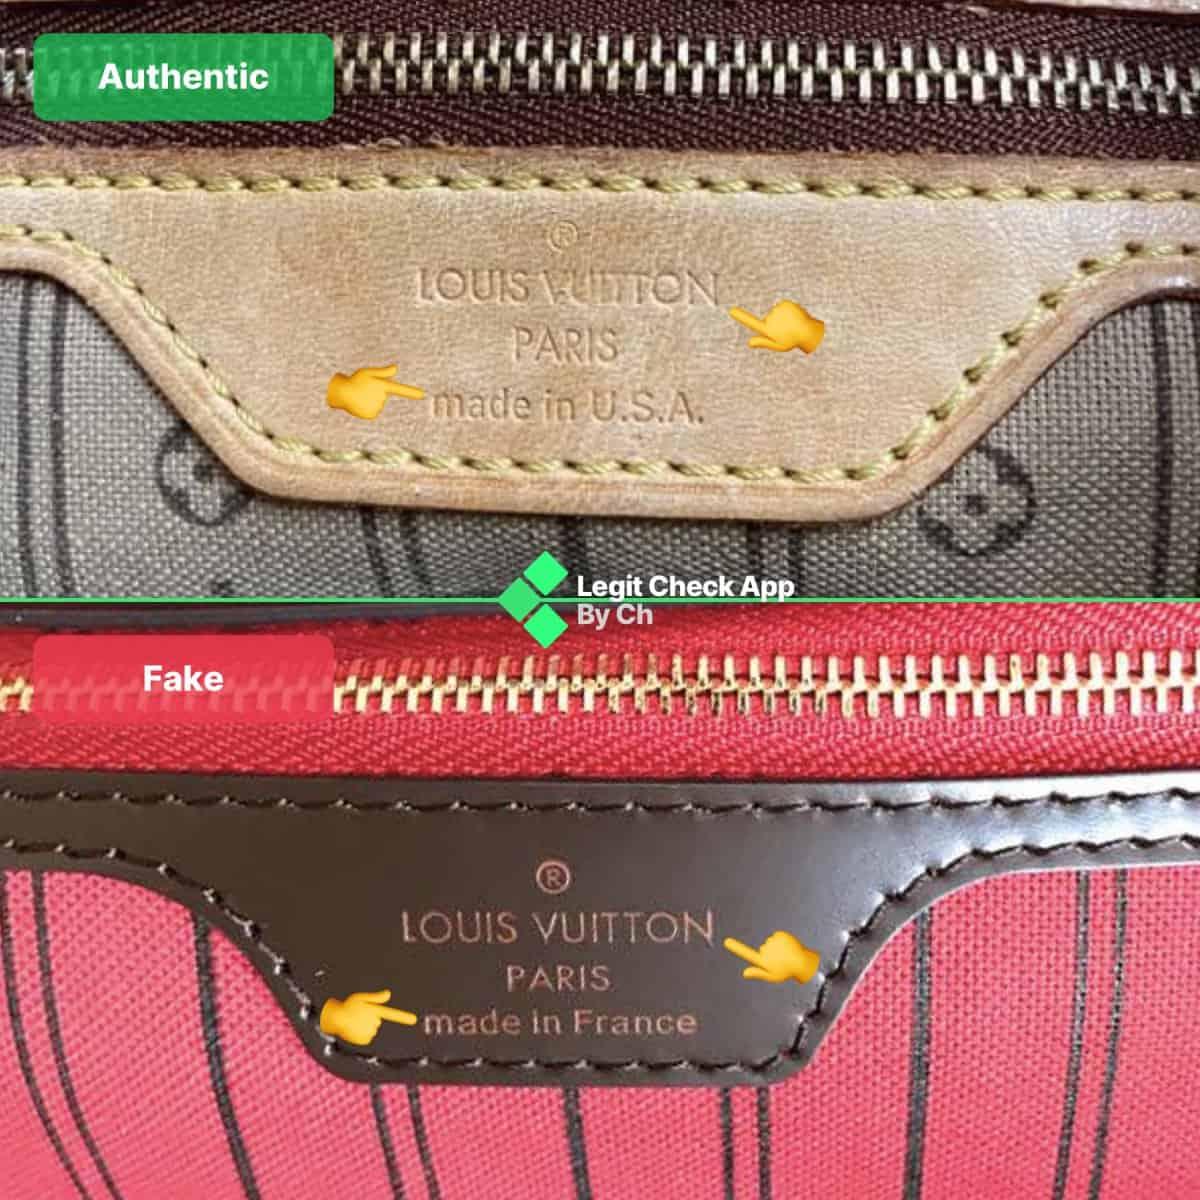 Louis Vuitton Neverfull Mm Real Vs Fake Bag Comparison Legit Check By Ch